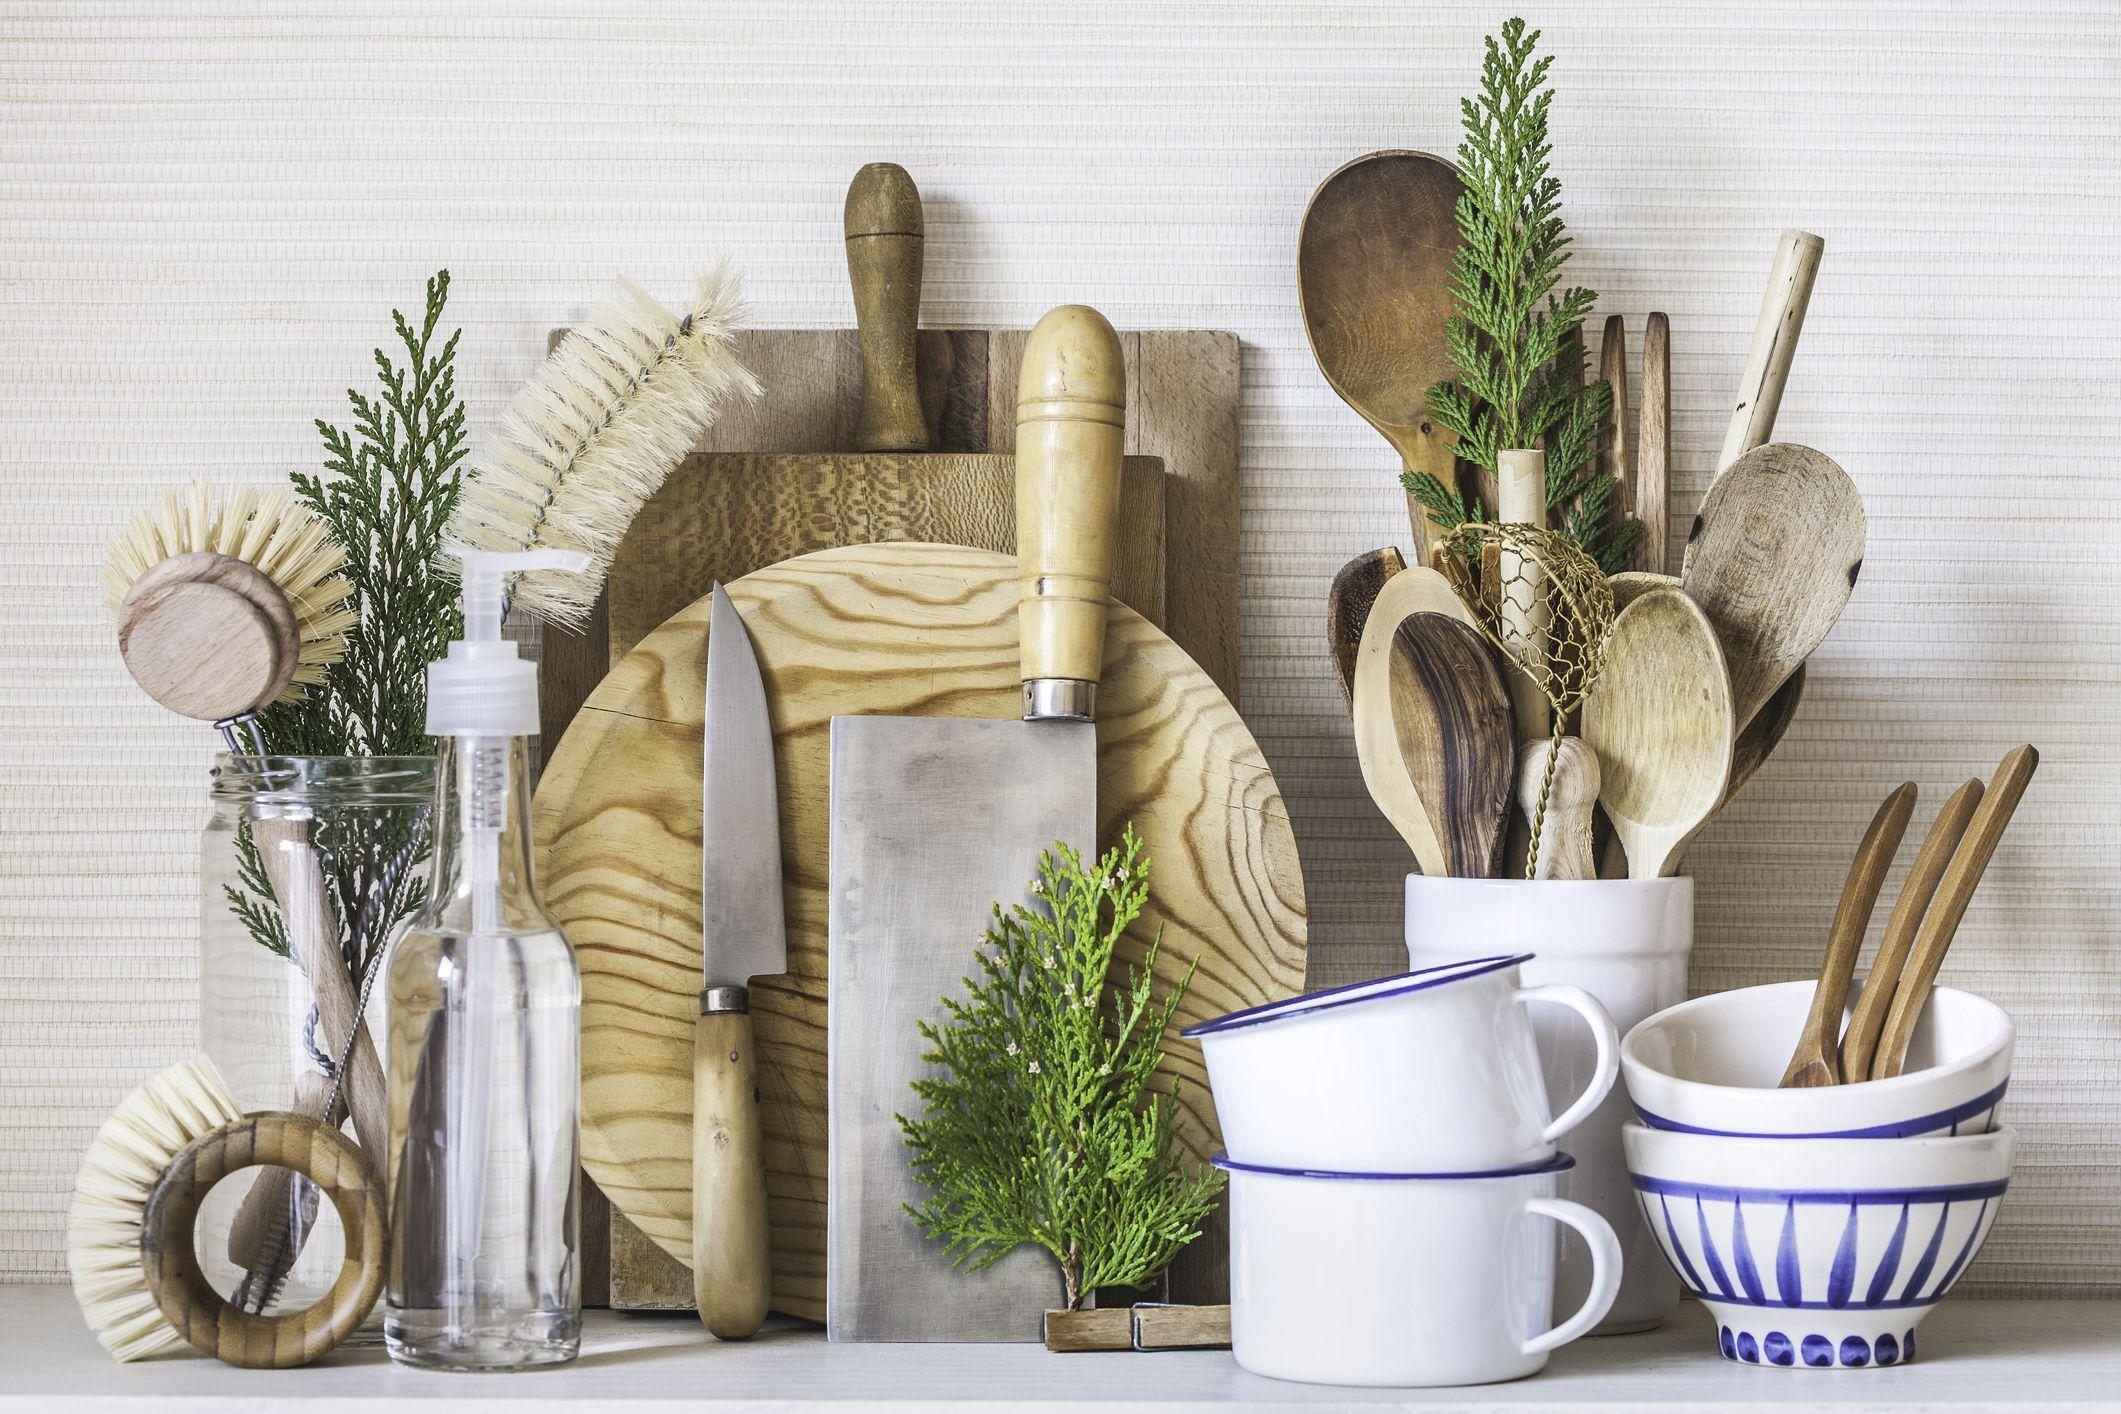 Eco_kitchen_getty